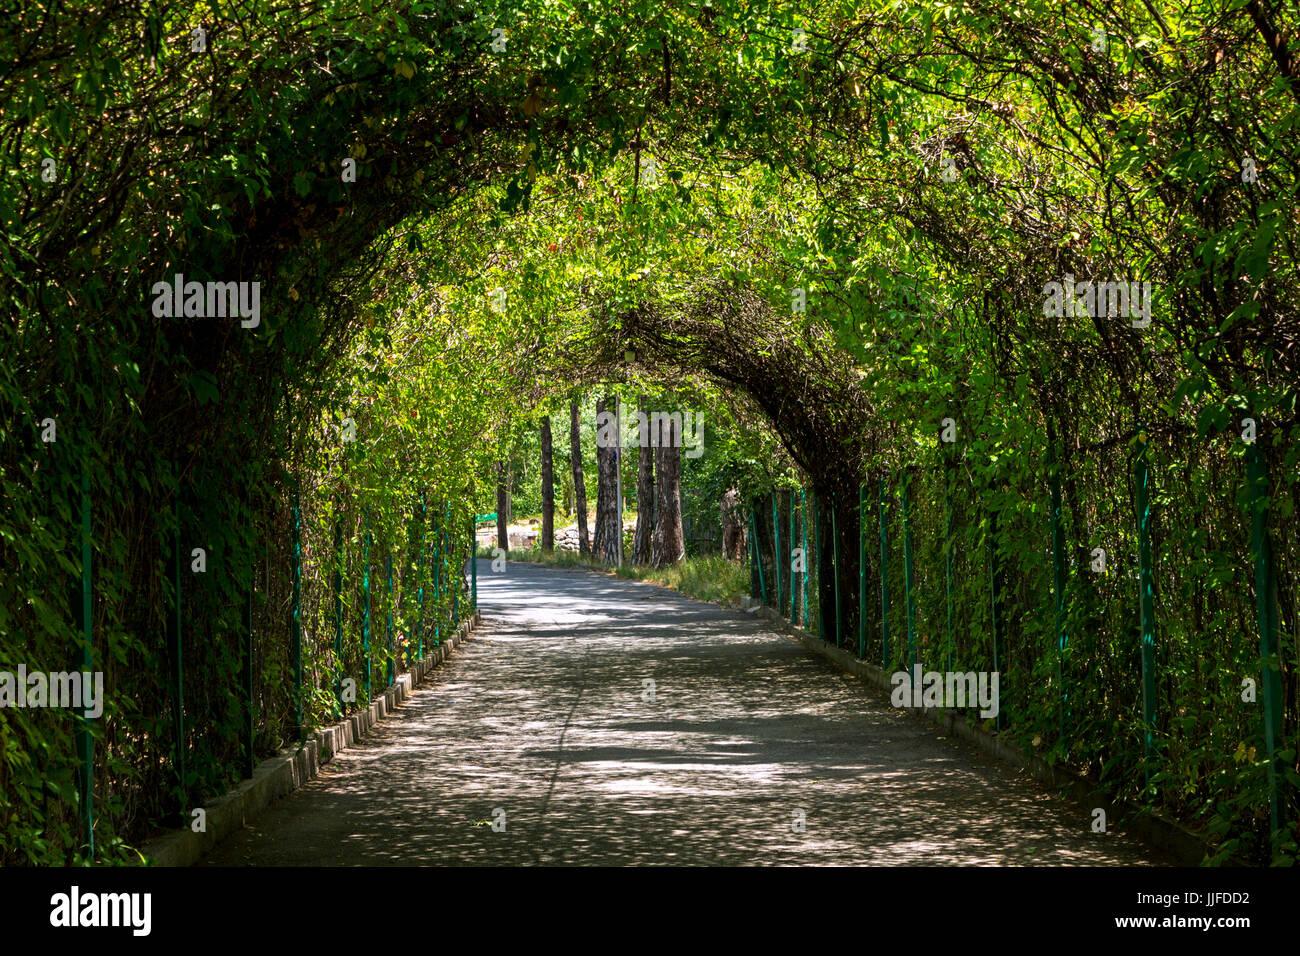 Green Tunnel In The Botanical Garden Of Yerevan Armenia Stock Photo Alamy